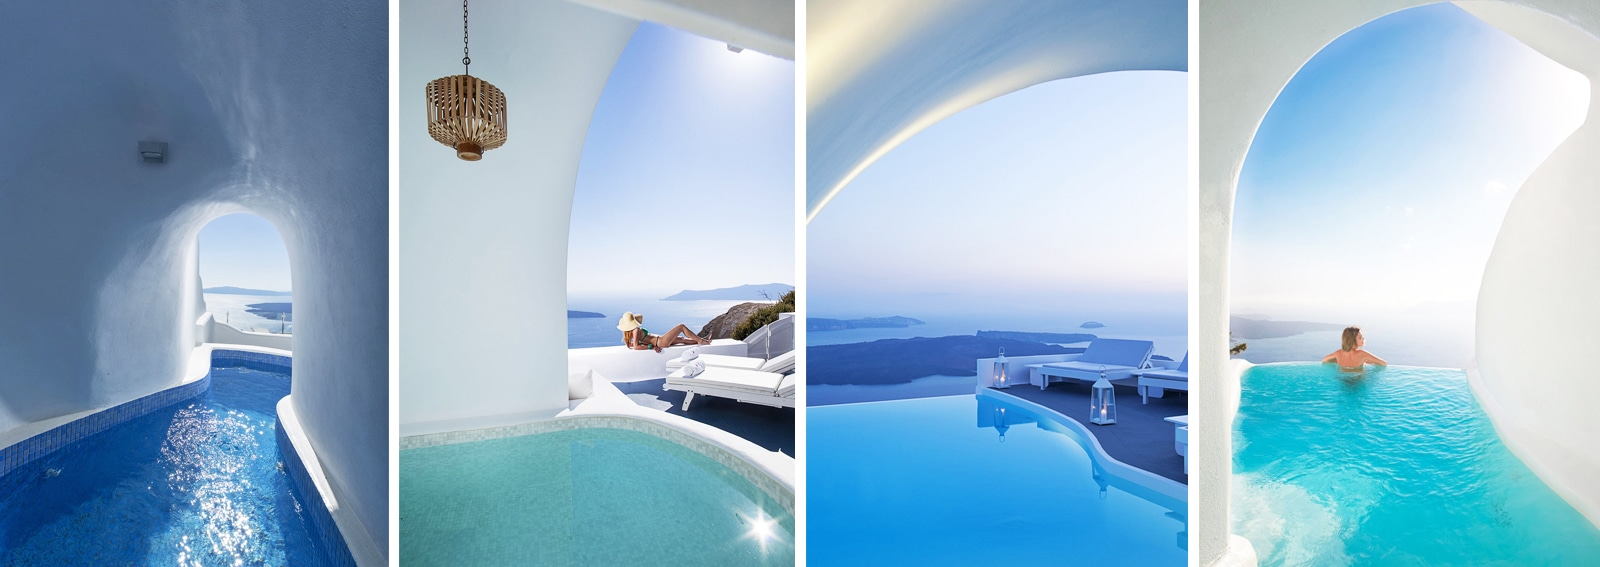 cover-santorini-piscine-grotta-desktop